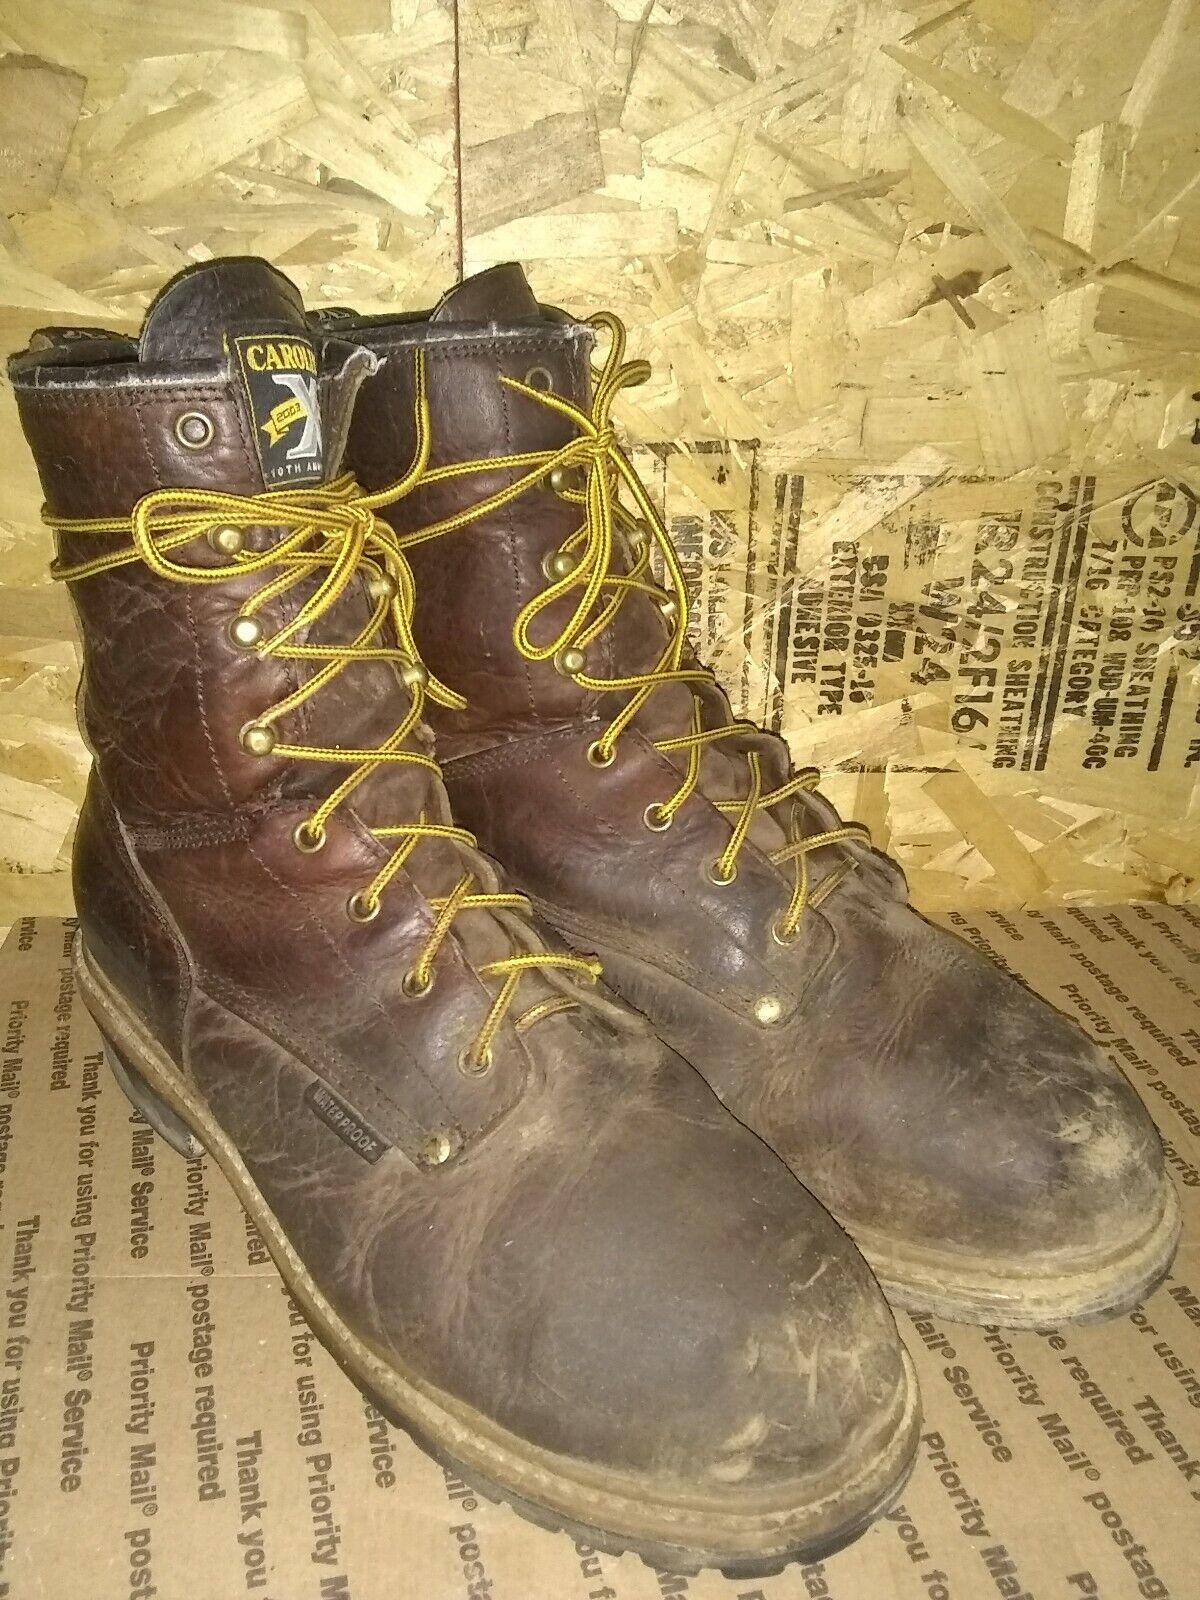 Carolina Logger Boots CA5823 400 Gram Insulated Waterproof Steel Toe Mens 12EE